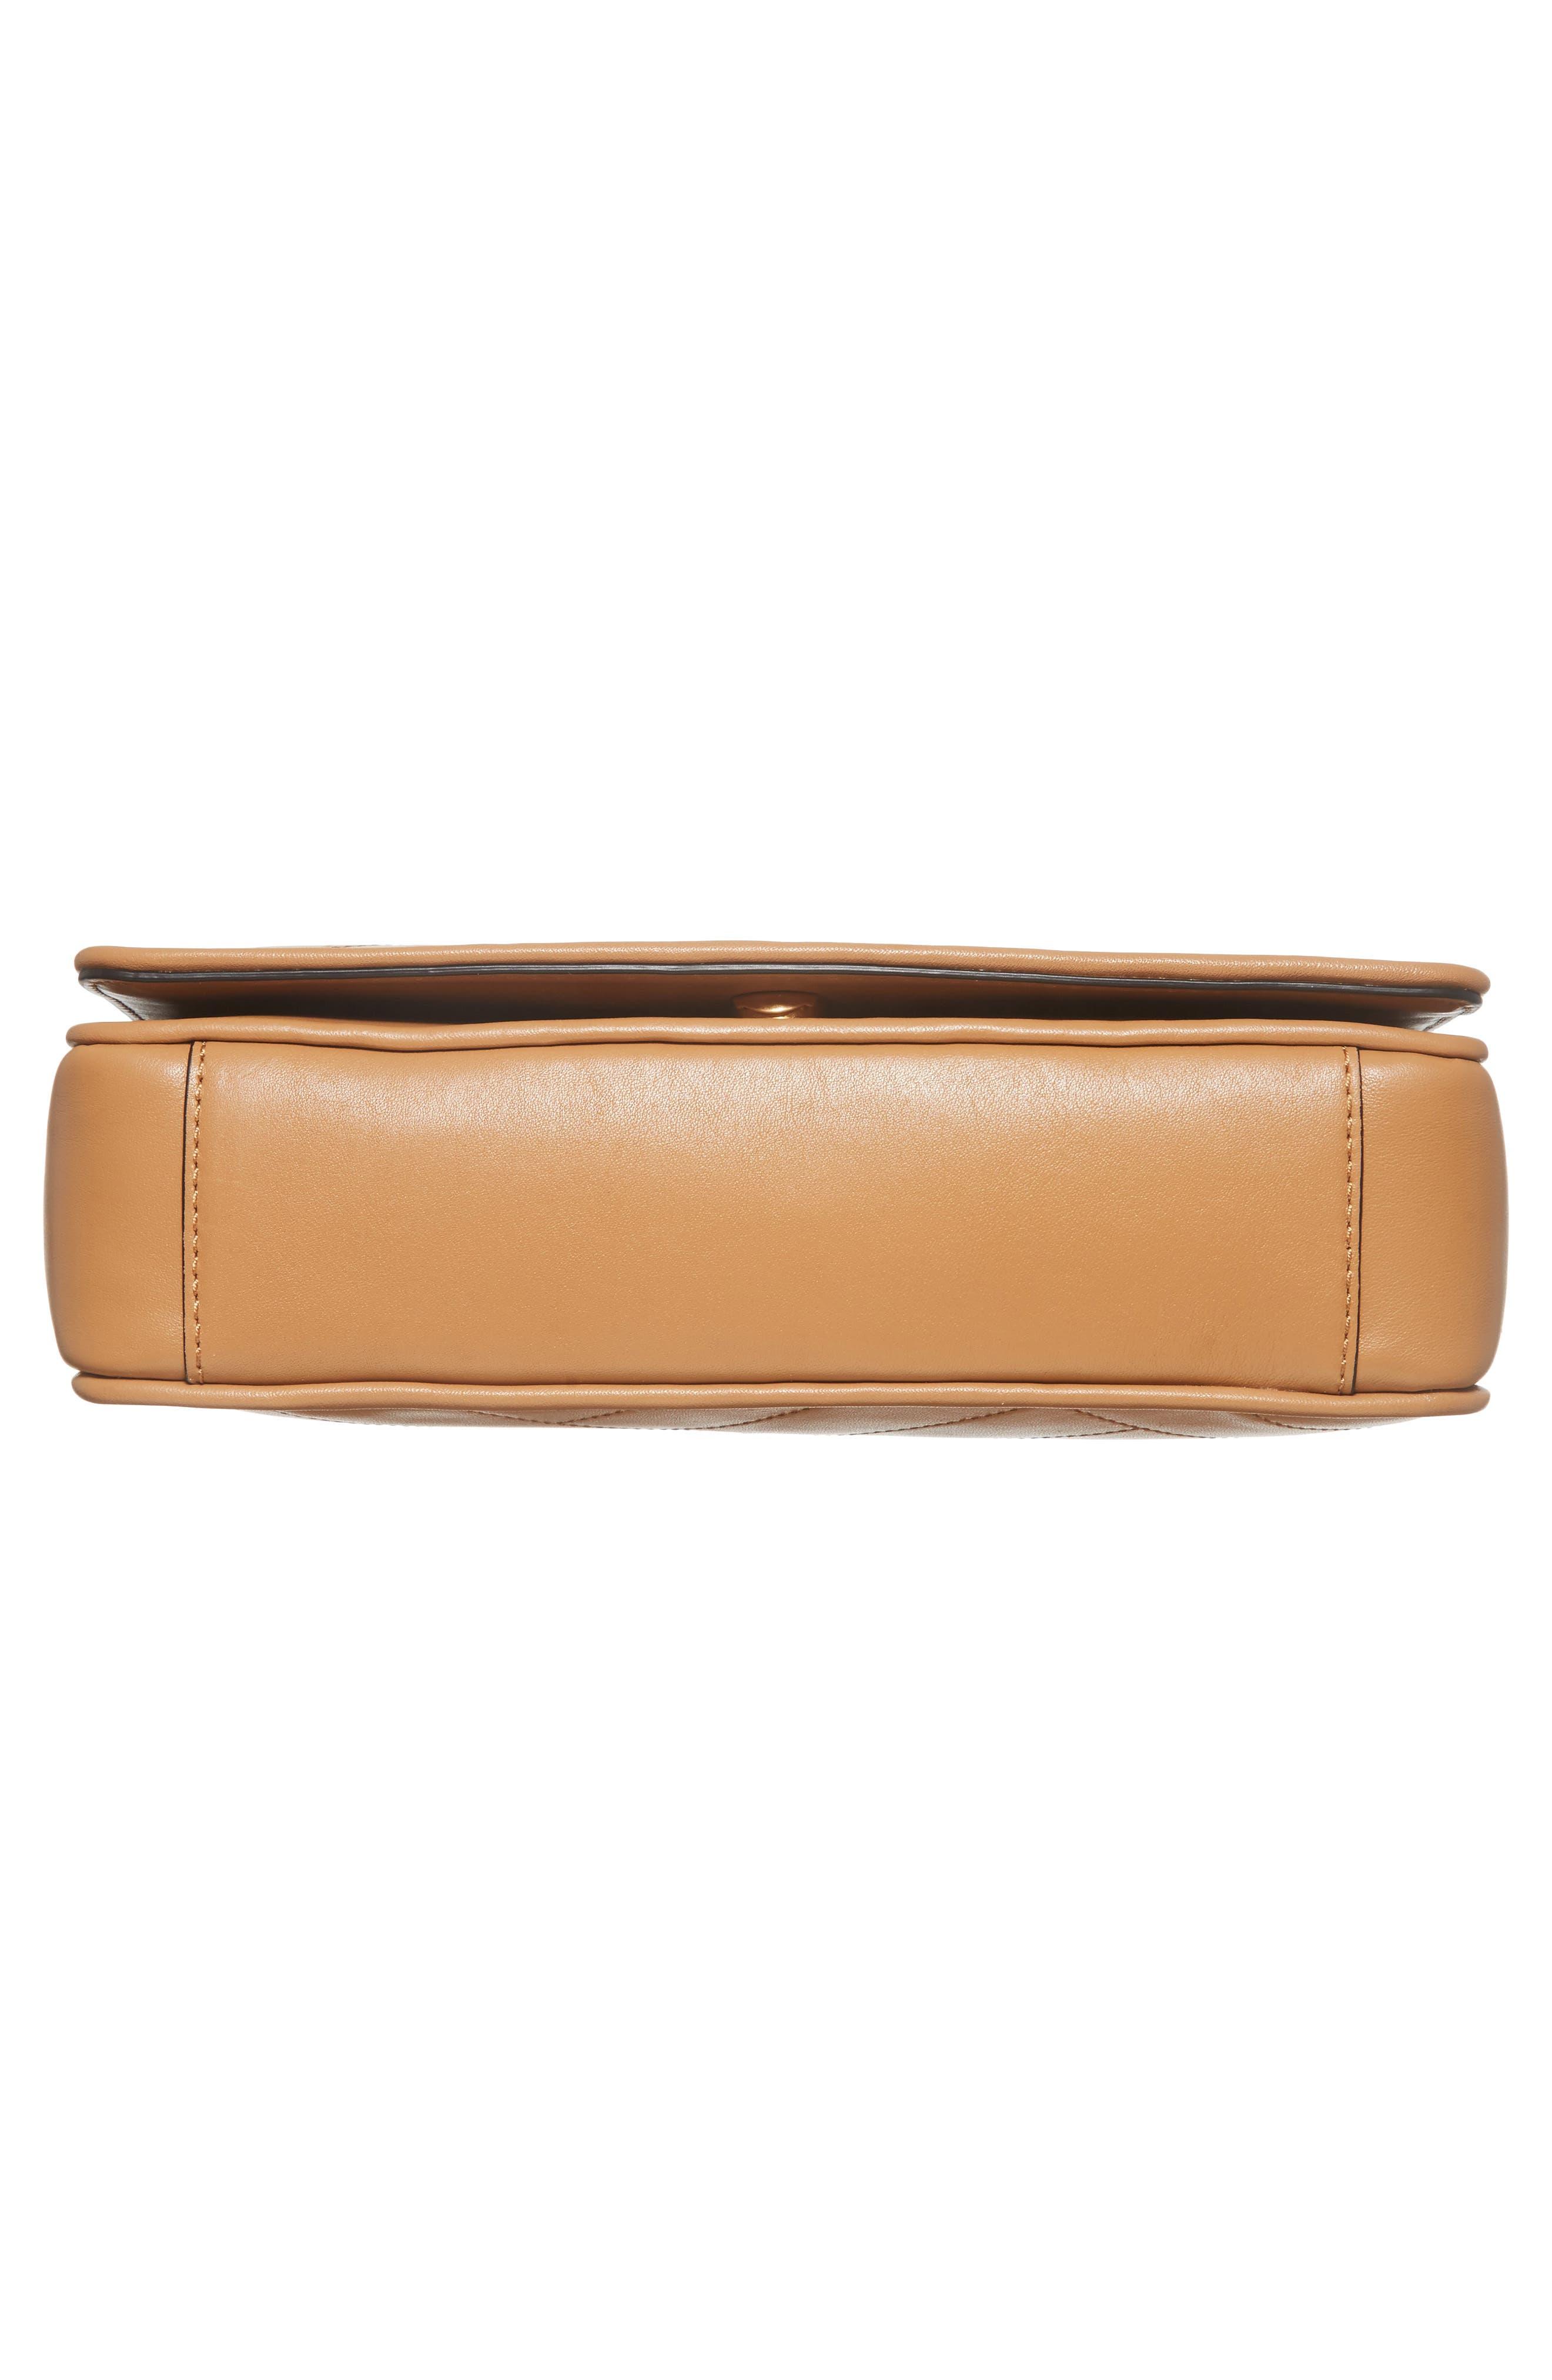 Alexa Leather Shoulder Bag,                             Alternate thumbnail 28, color,